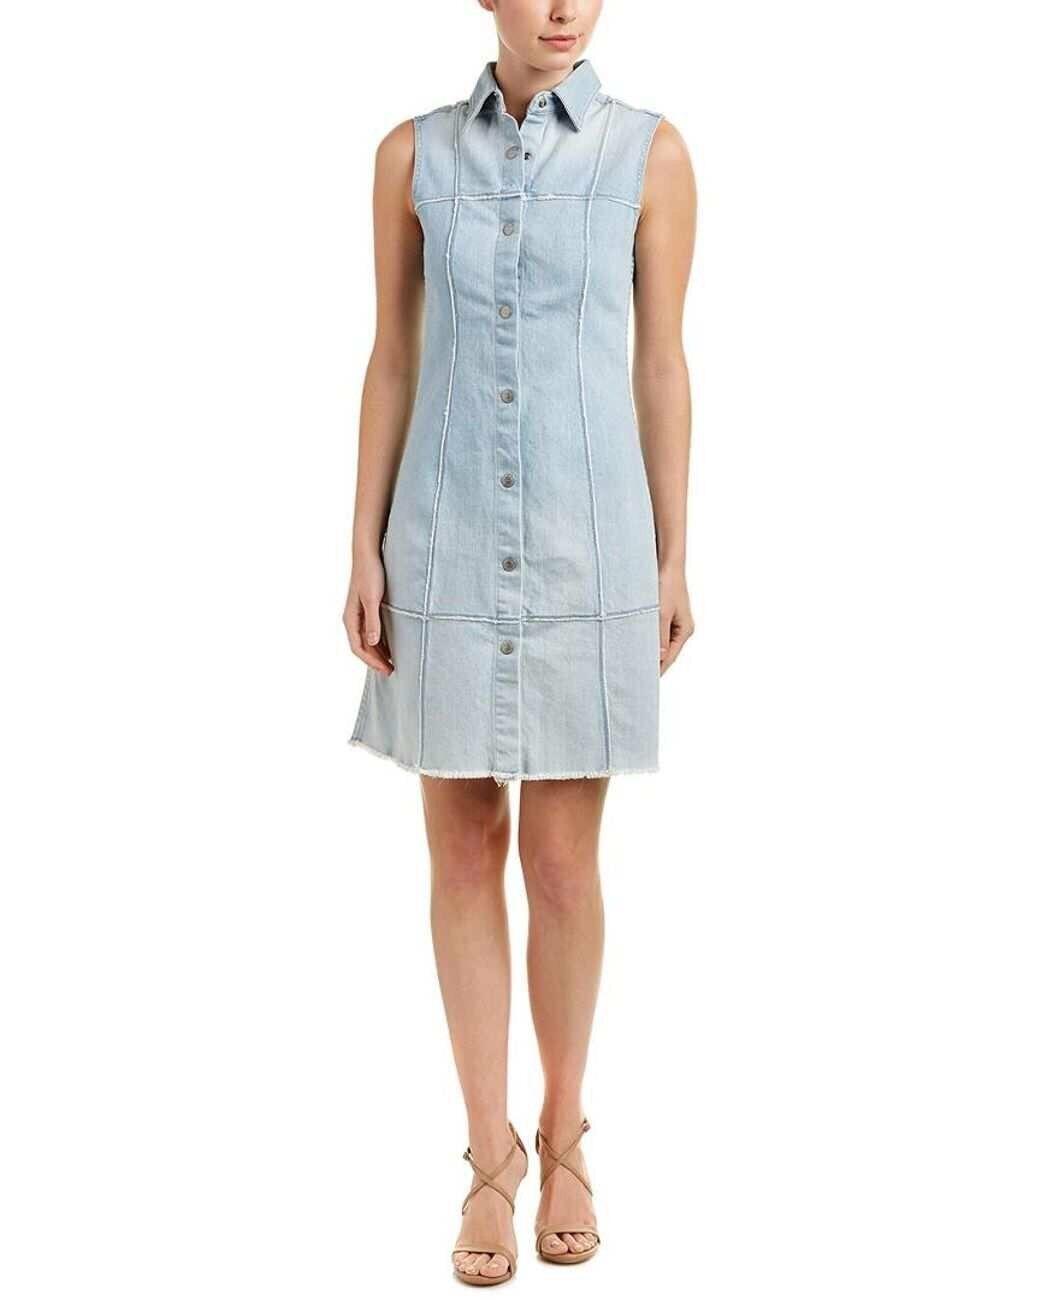 10c898bcee68 NWT NWT NWT AG denim dress sleeveless Size XS 11d336 - coats ...